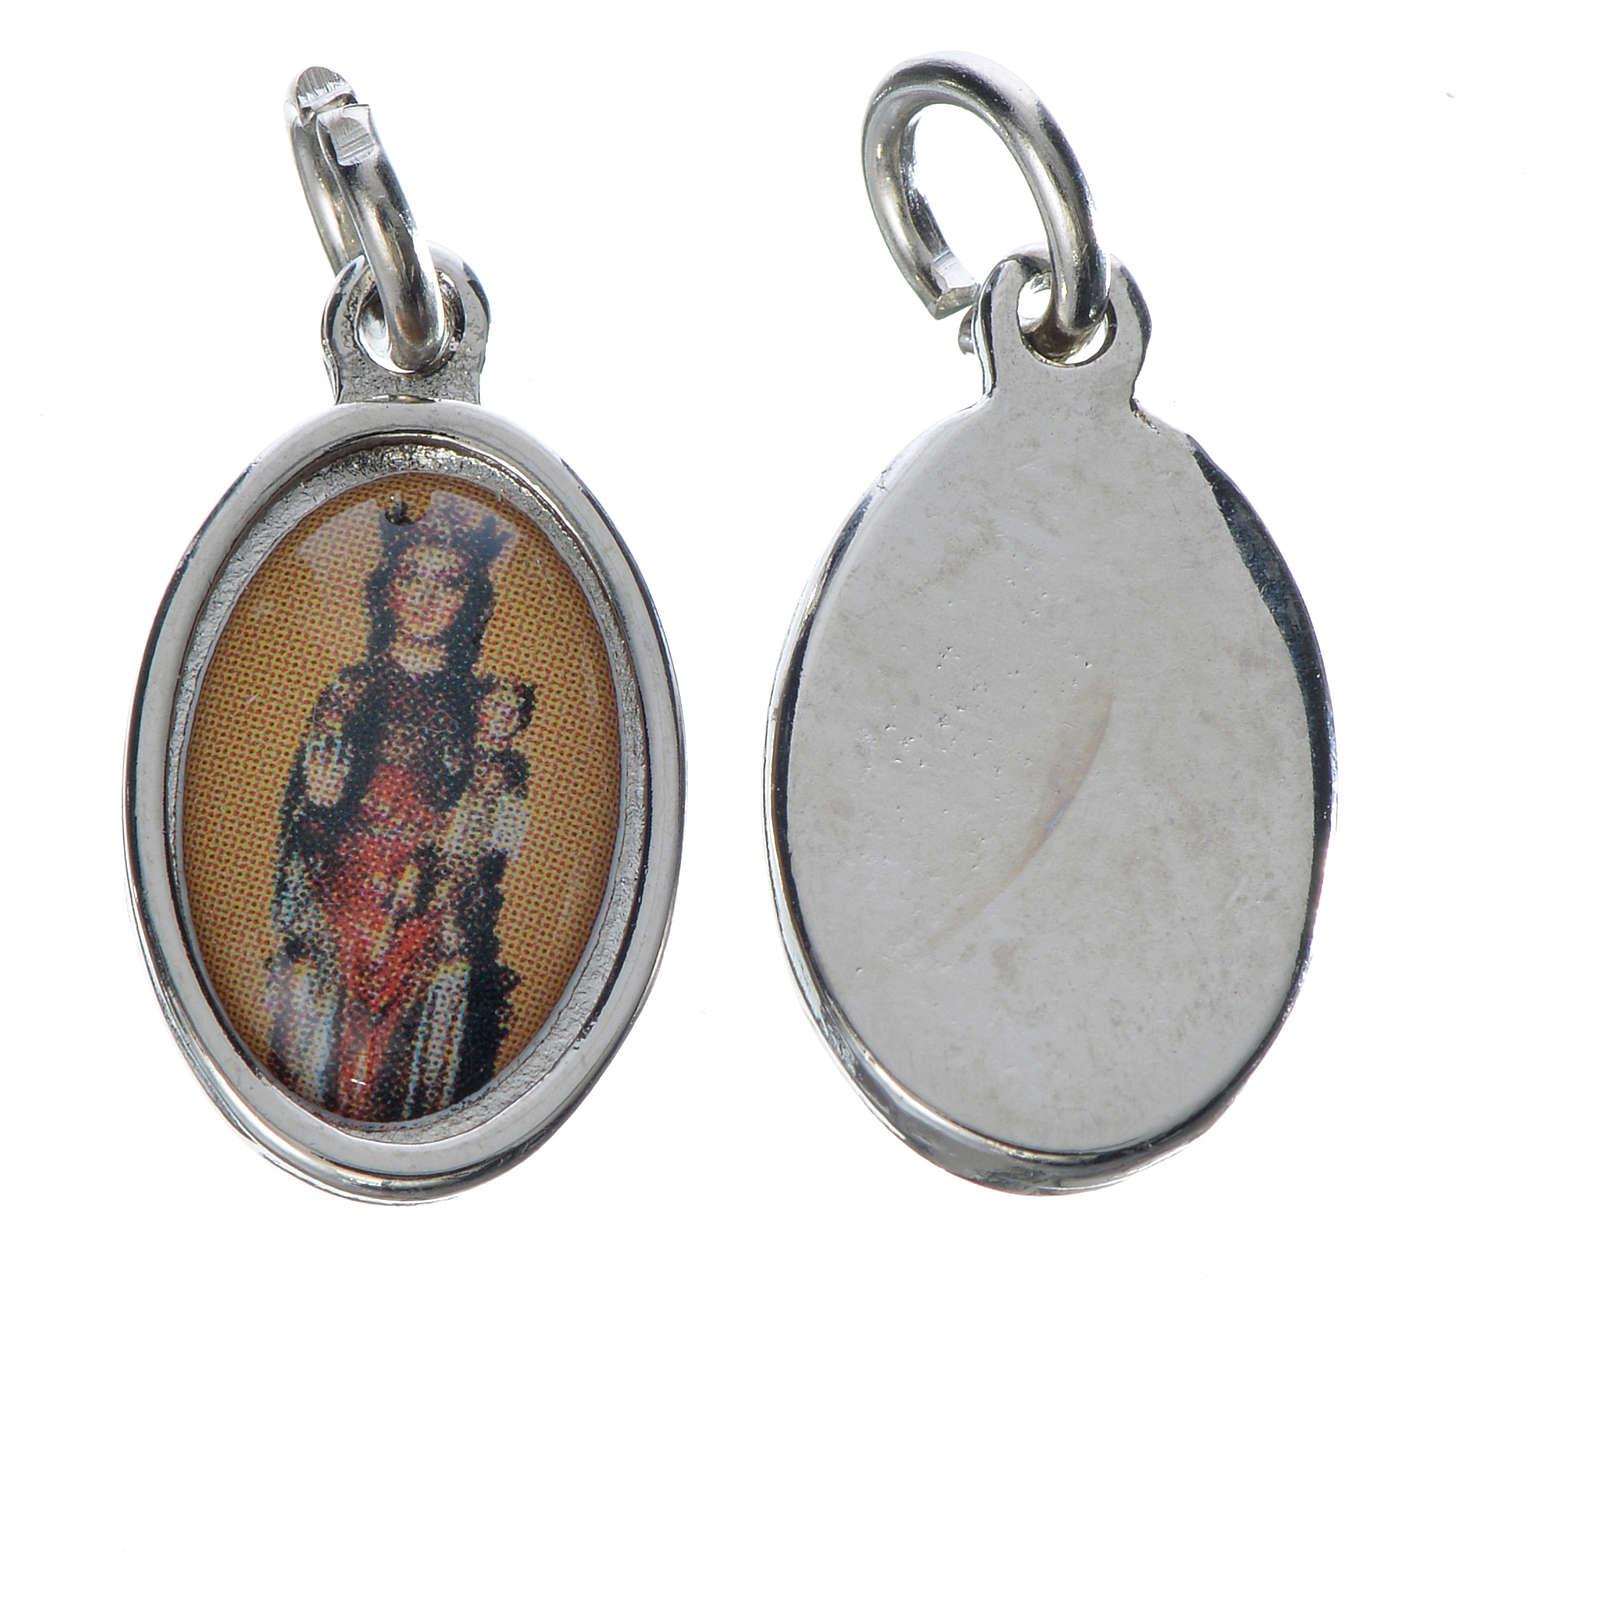 Medaglia N.D. de Fenestre metallo argentato 1,5cm 4